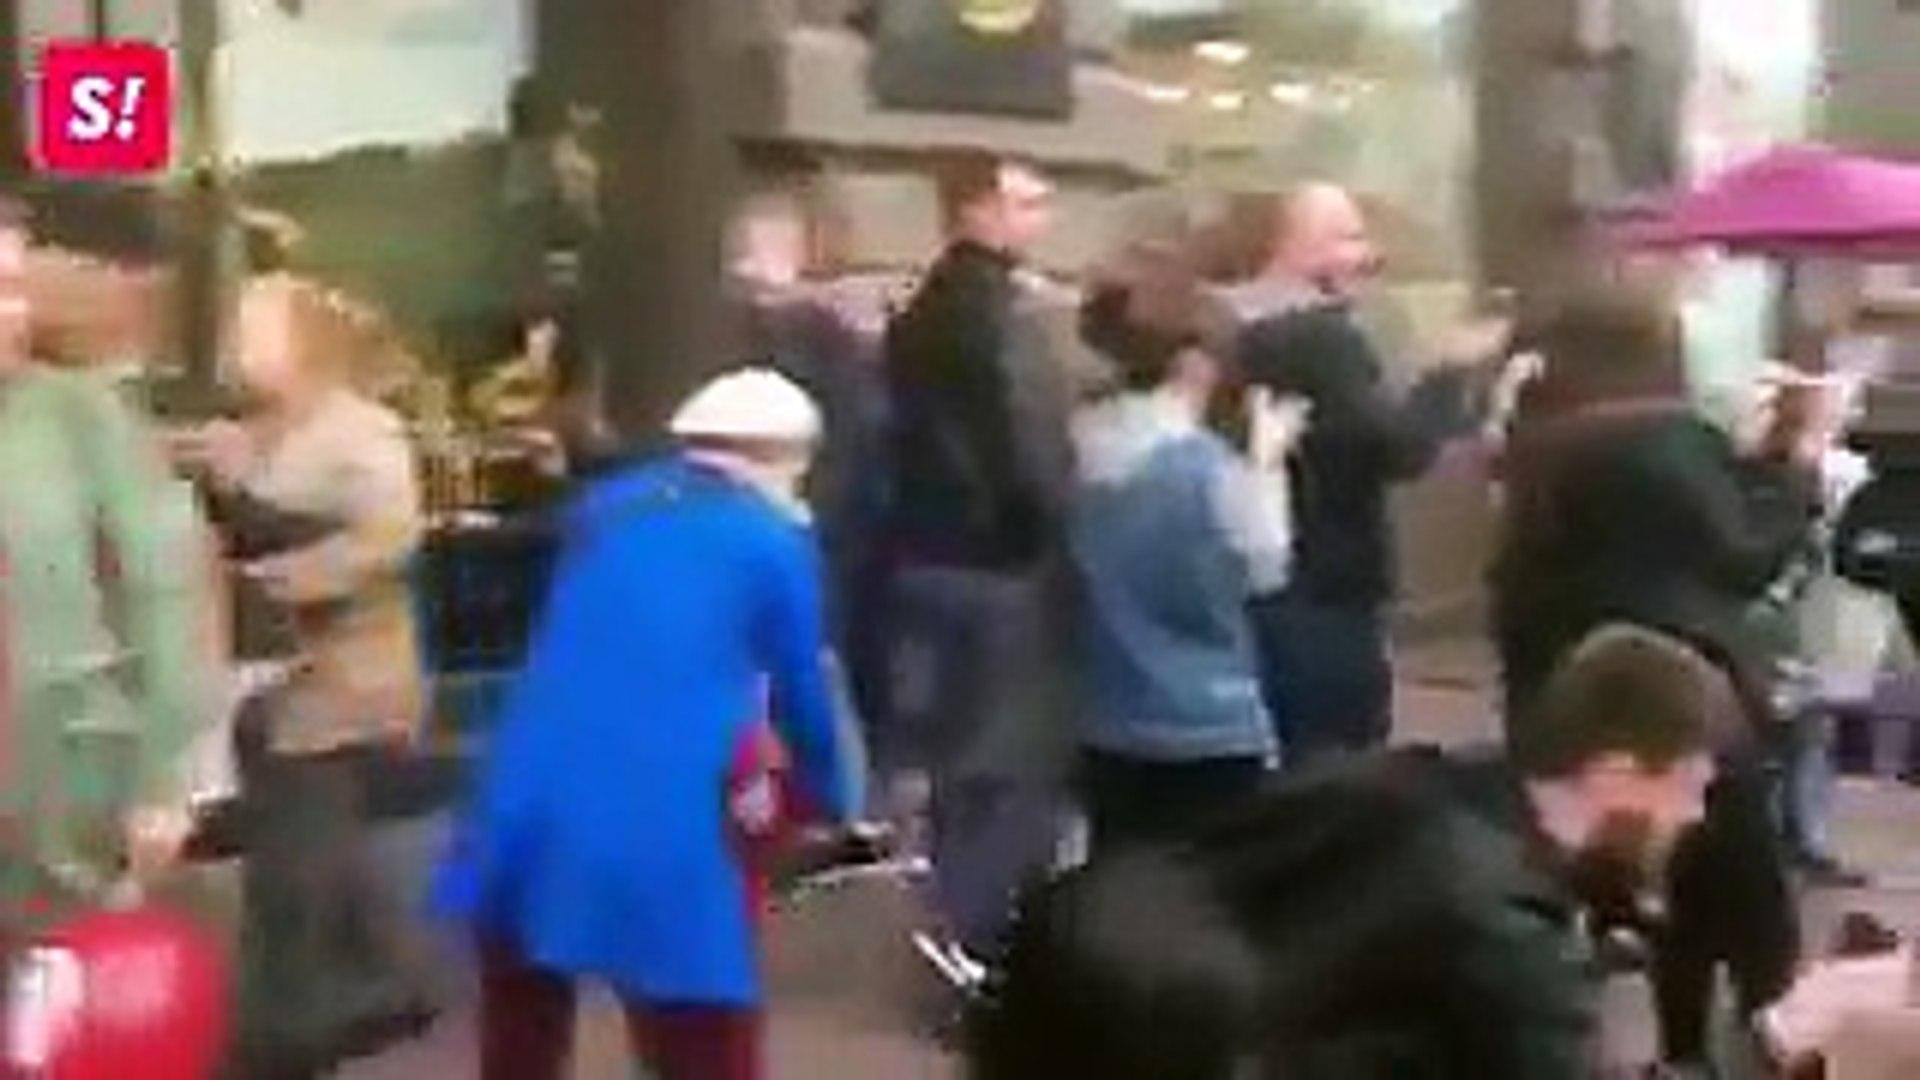 Екс-мер Архангельська водить на повідку Дональда Трампа по Санкт-Петербургу